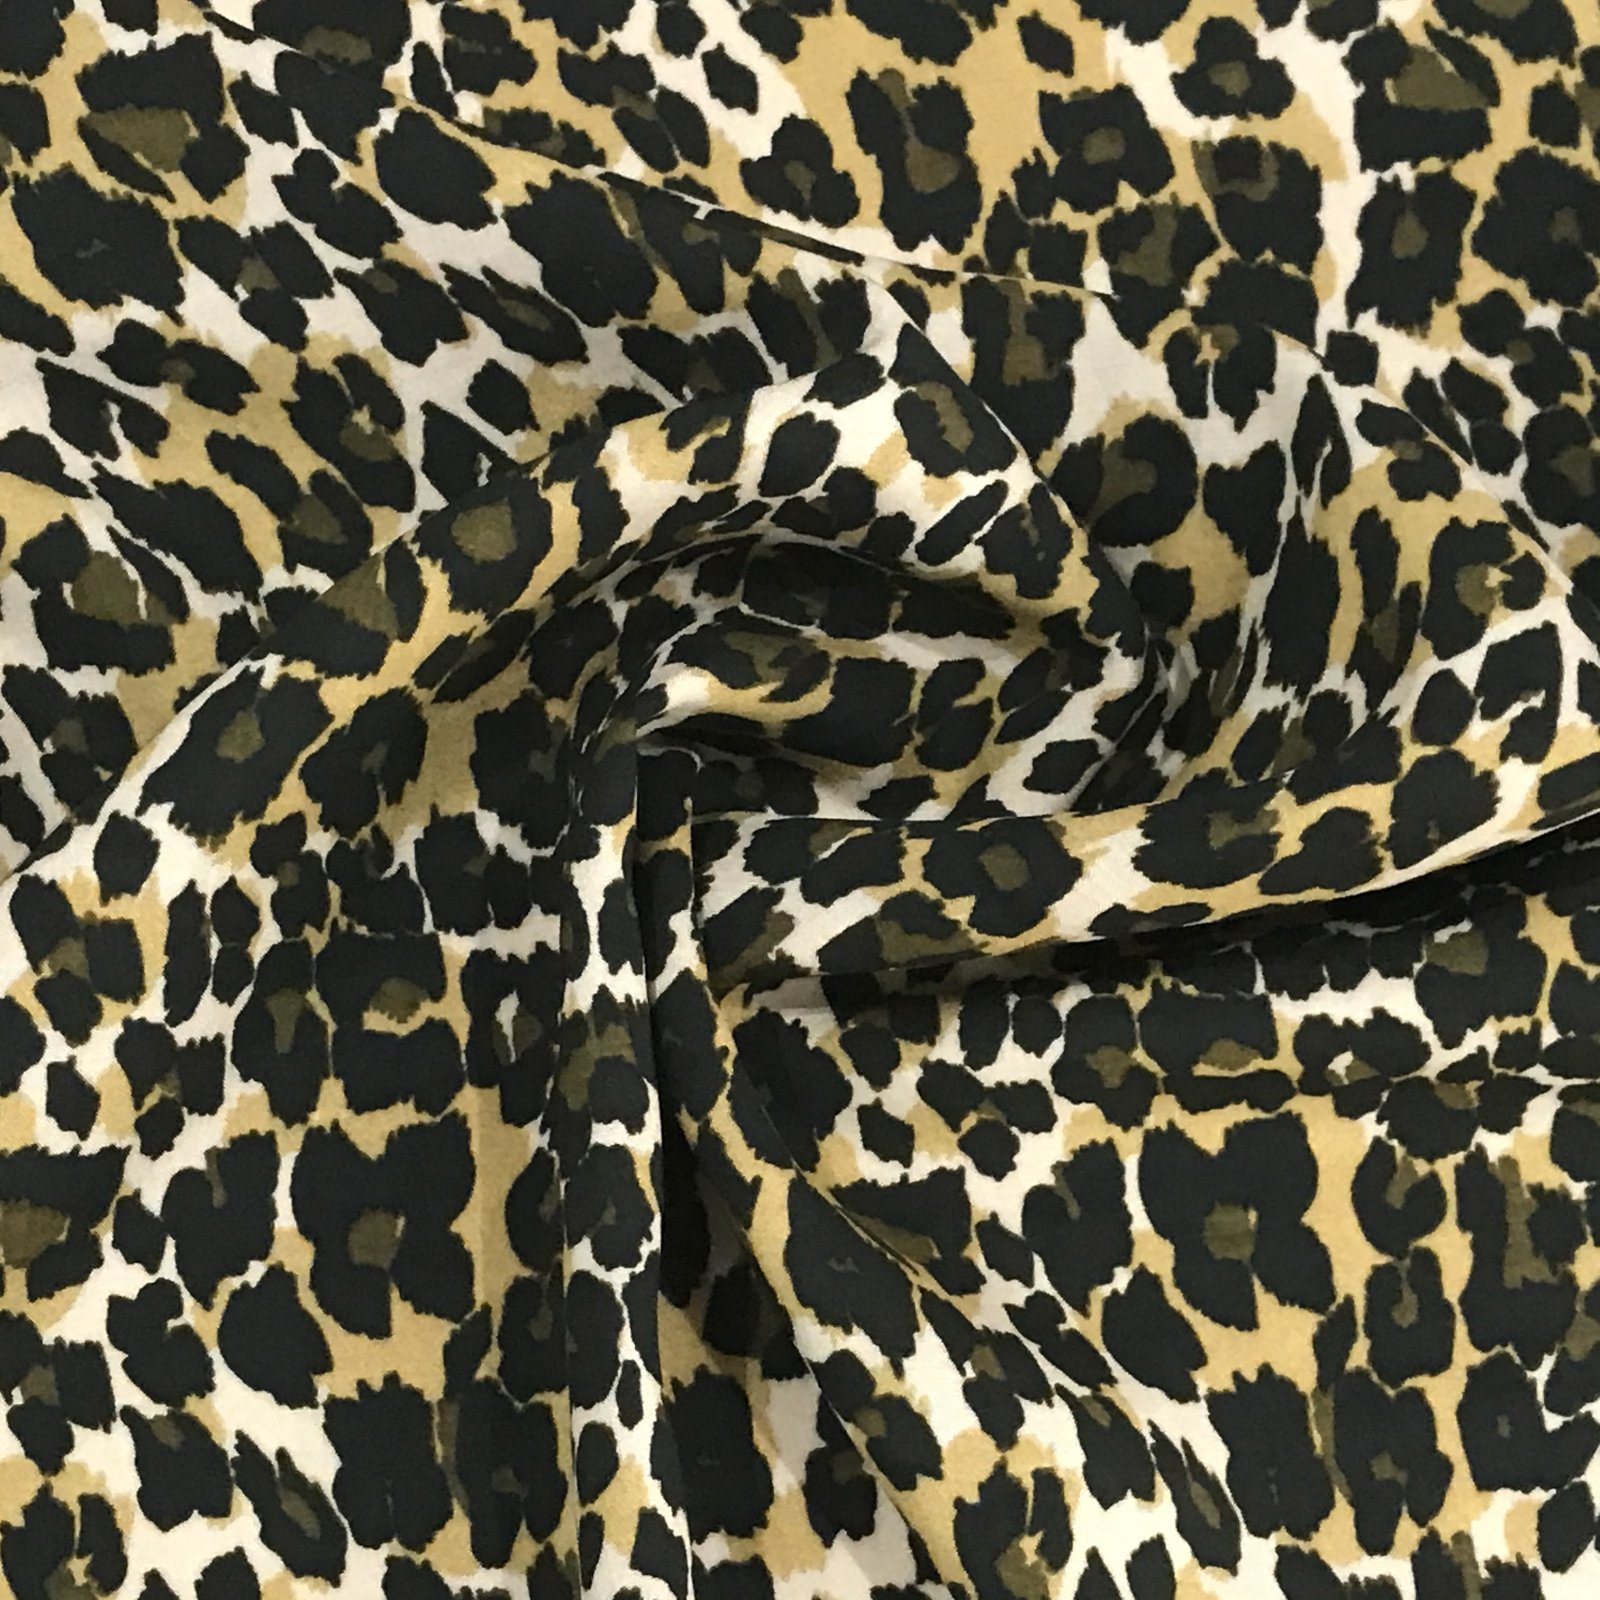 Viscose Challis - Cheetah Print